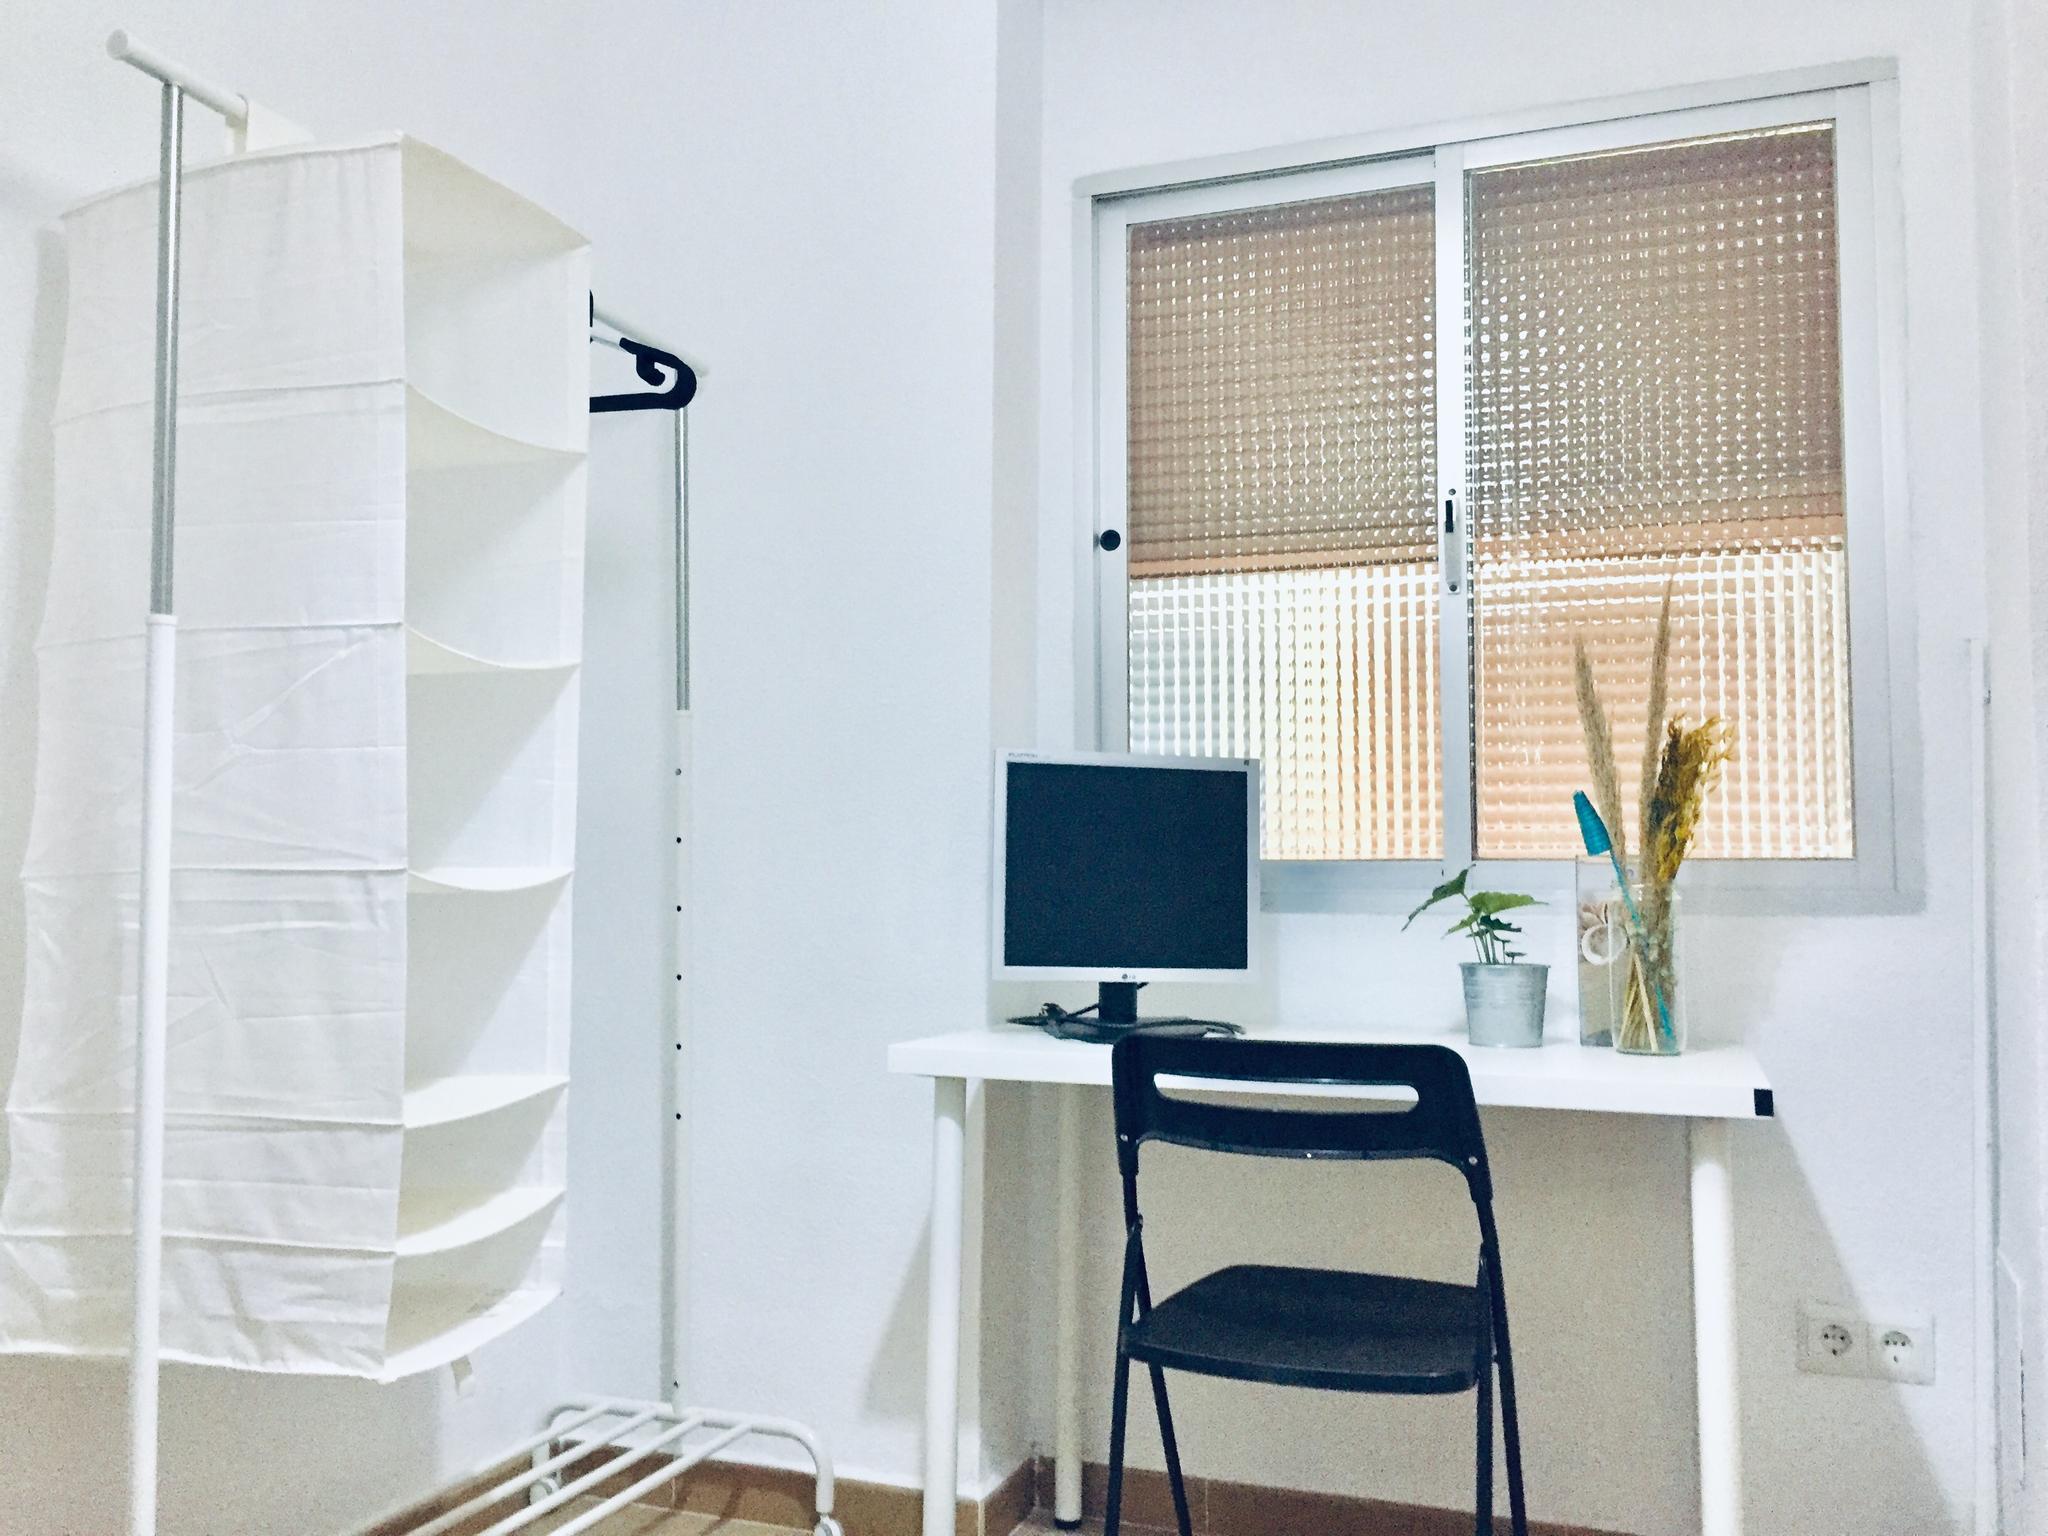 Tejeros - Bedroom in shared flat in Malaga